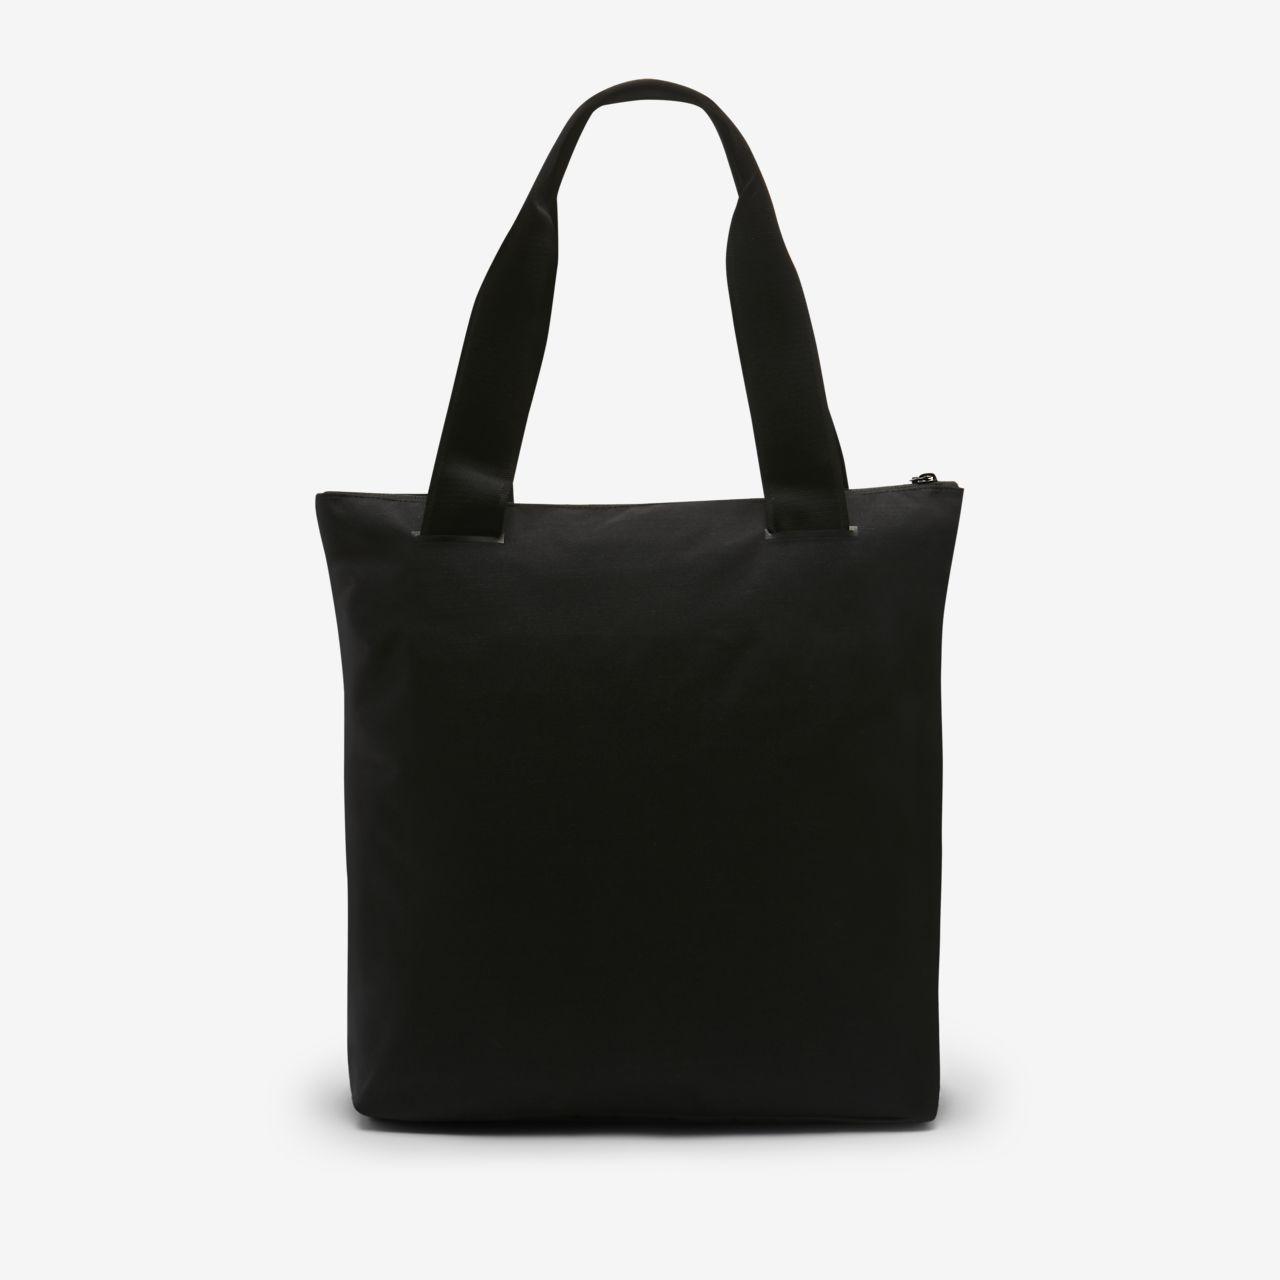 1e484a6dc0f Γυναικεία τσάντα ώμου με σχέδια για προπόνηση Nike Radiate. Nike.com GR